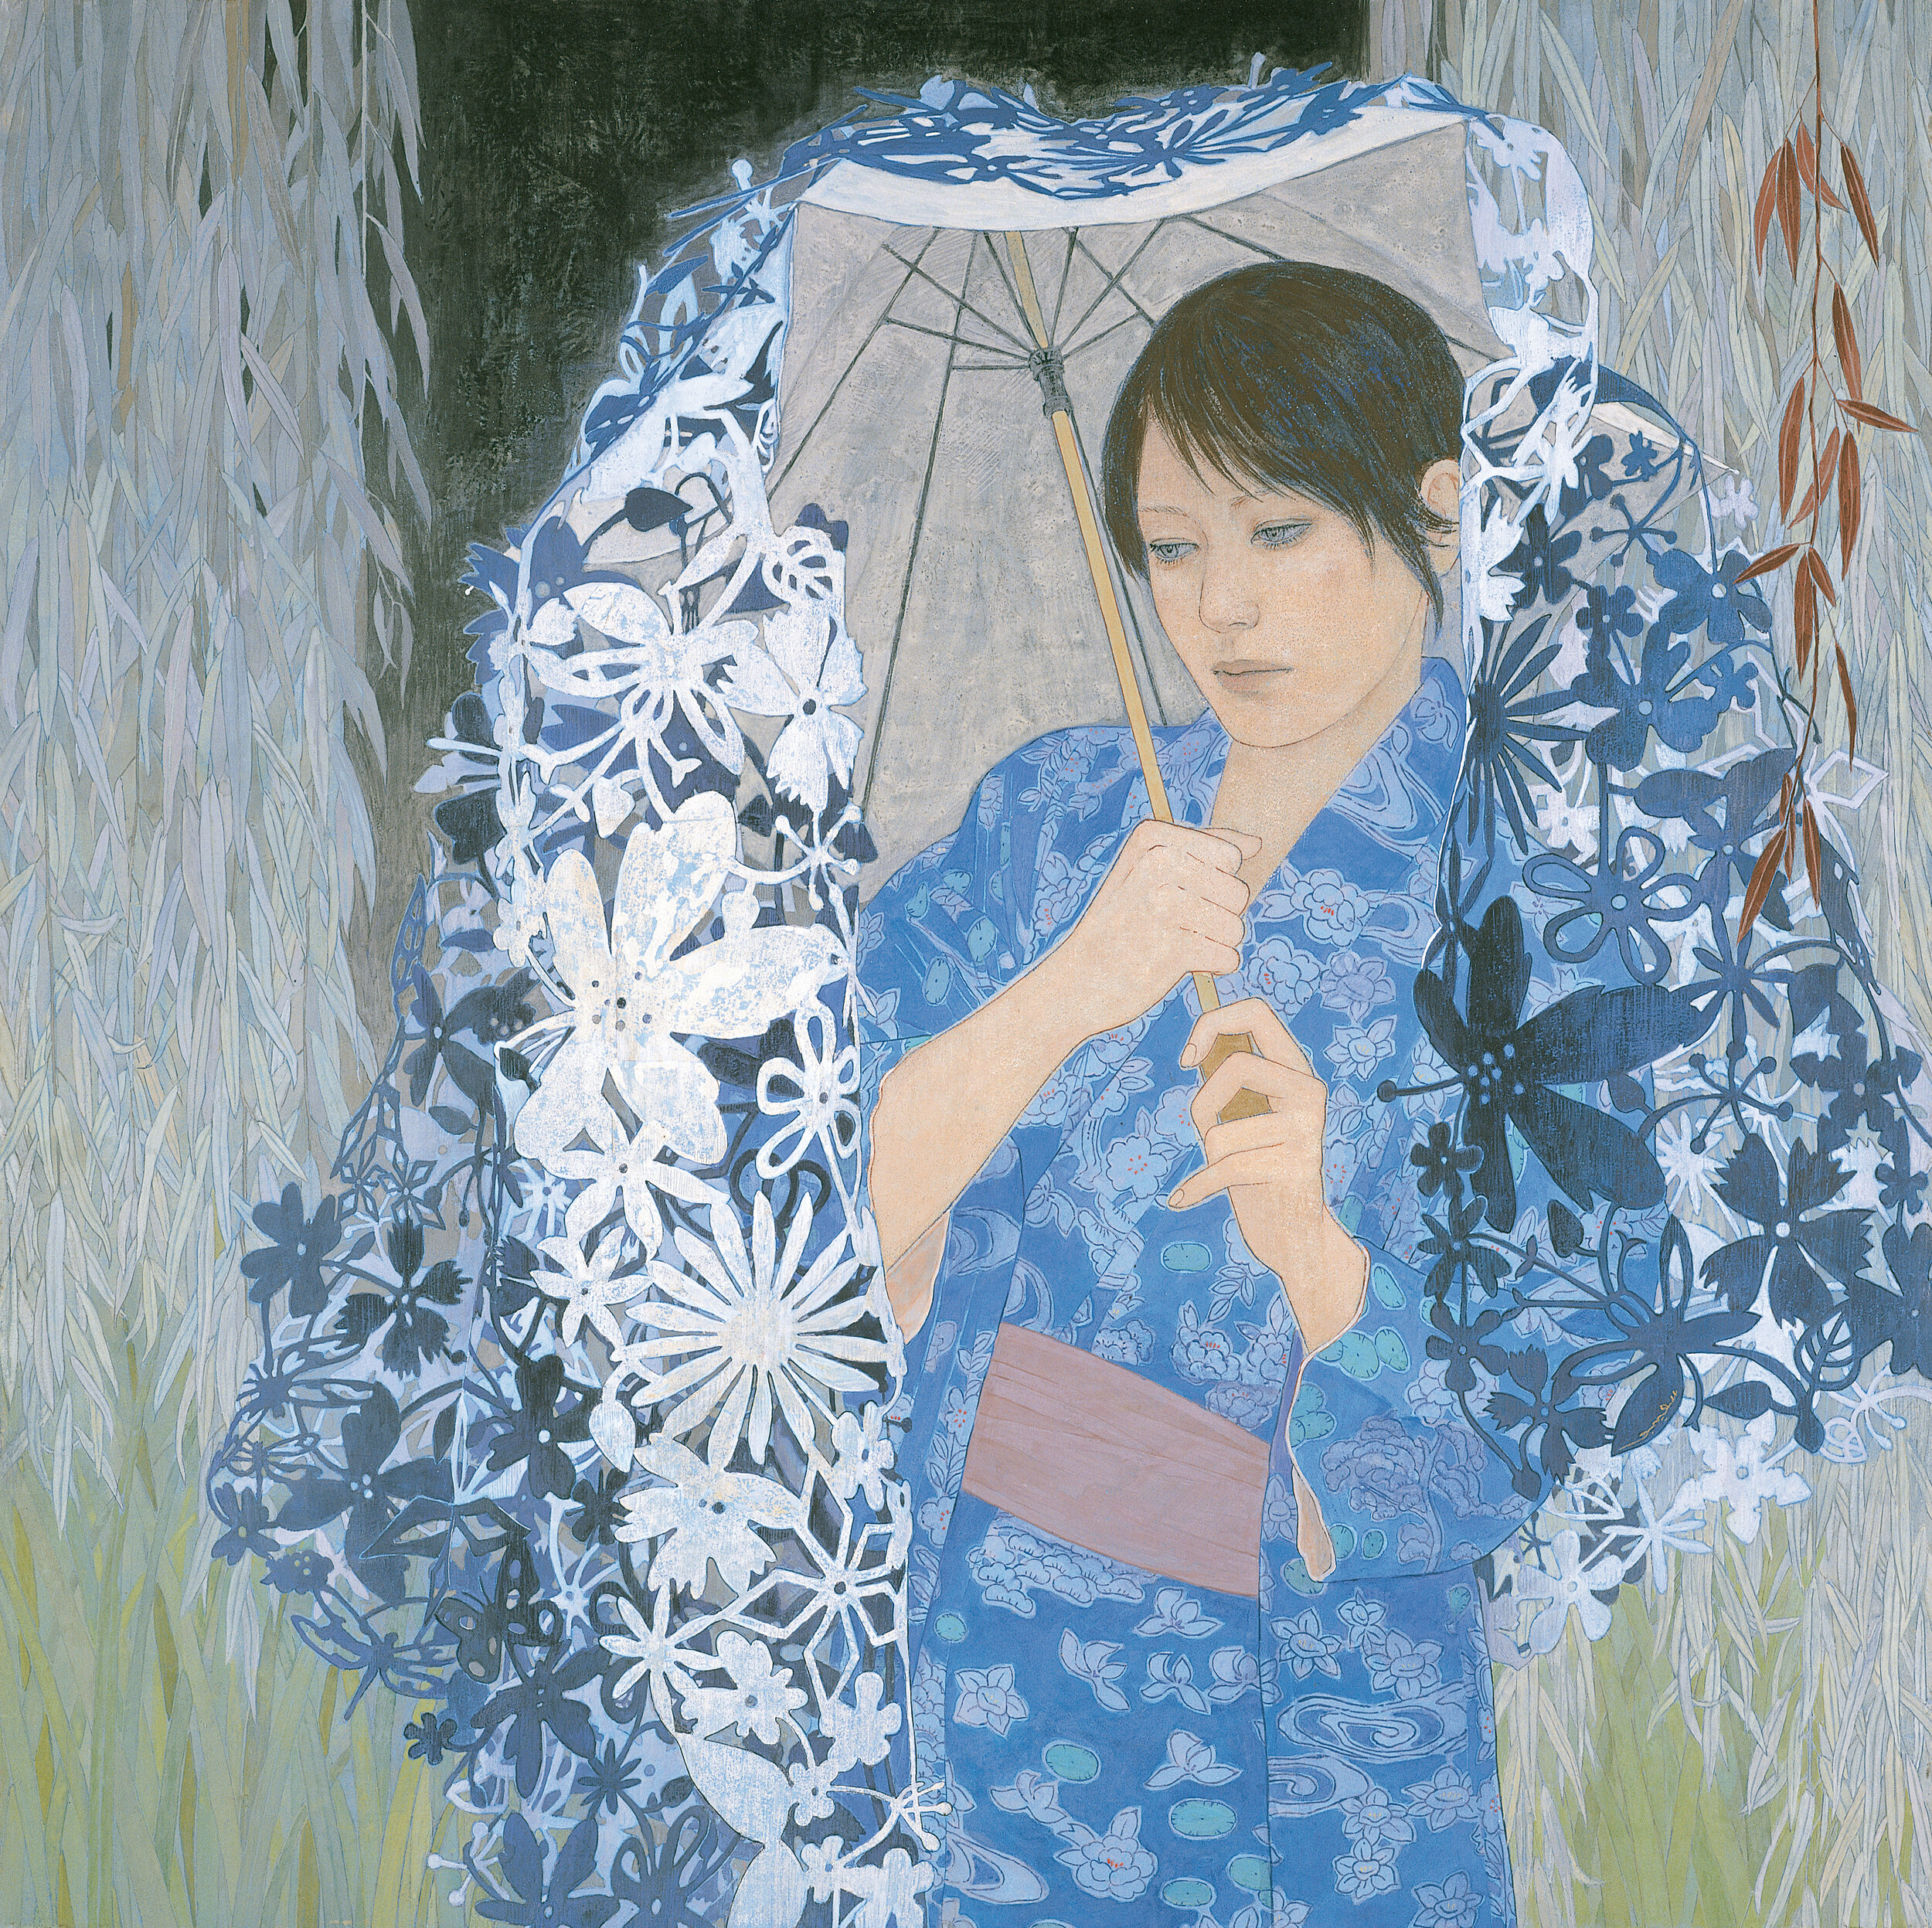 madoka fujiwara 'the smell of rain' 2004